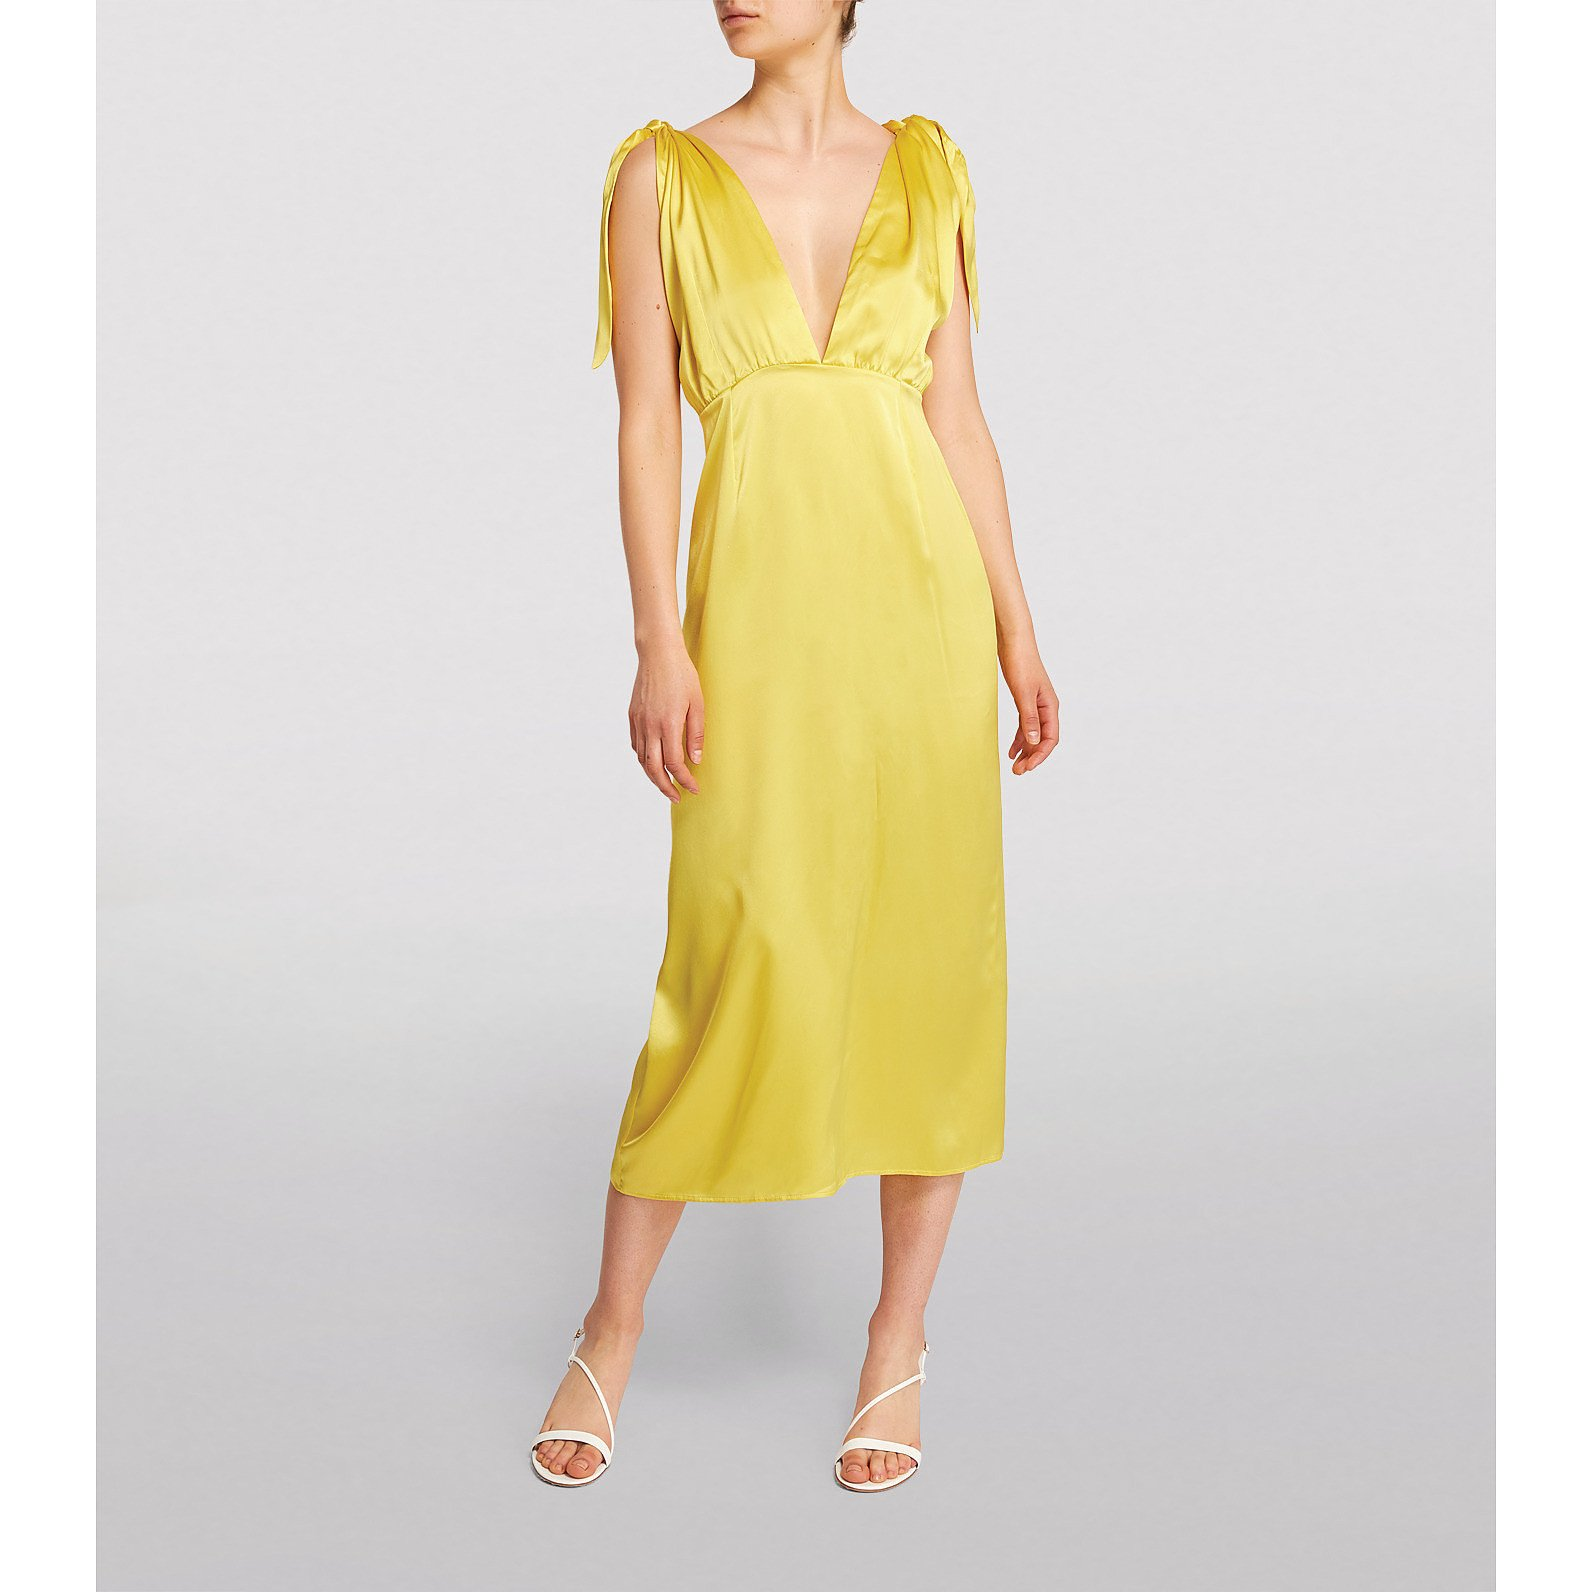 Bernadette John Sleeveless Dress